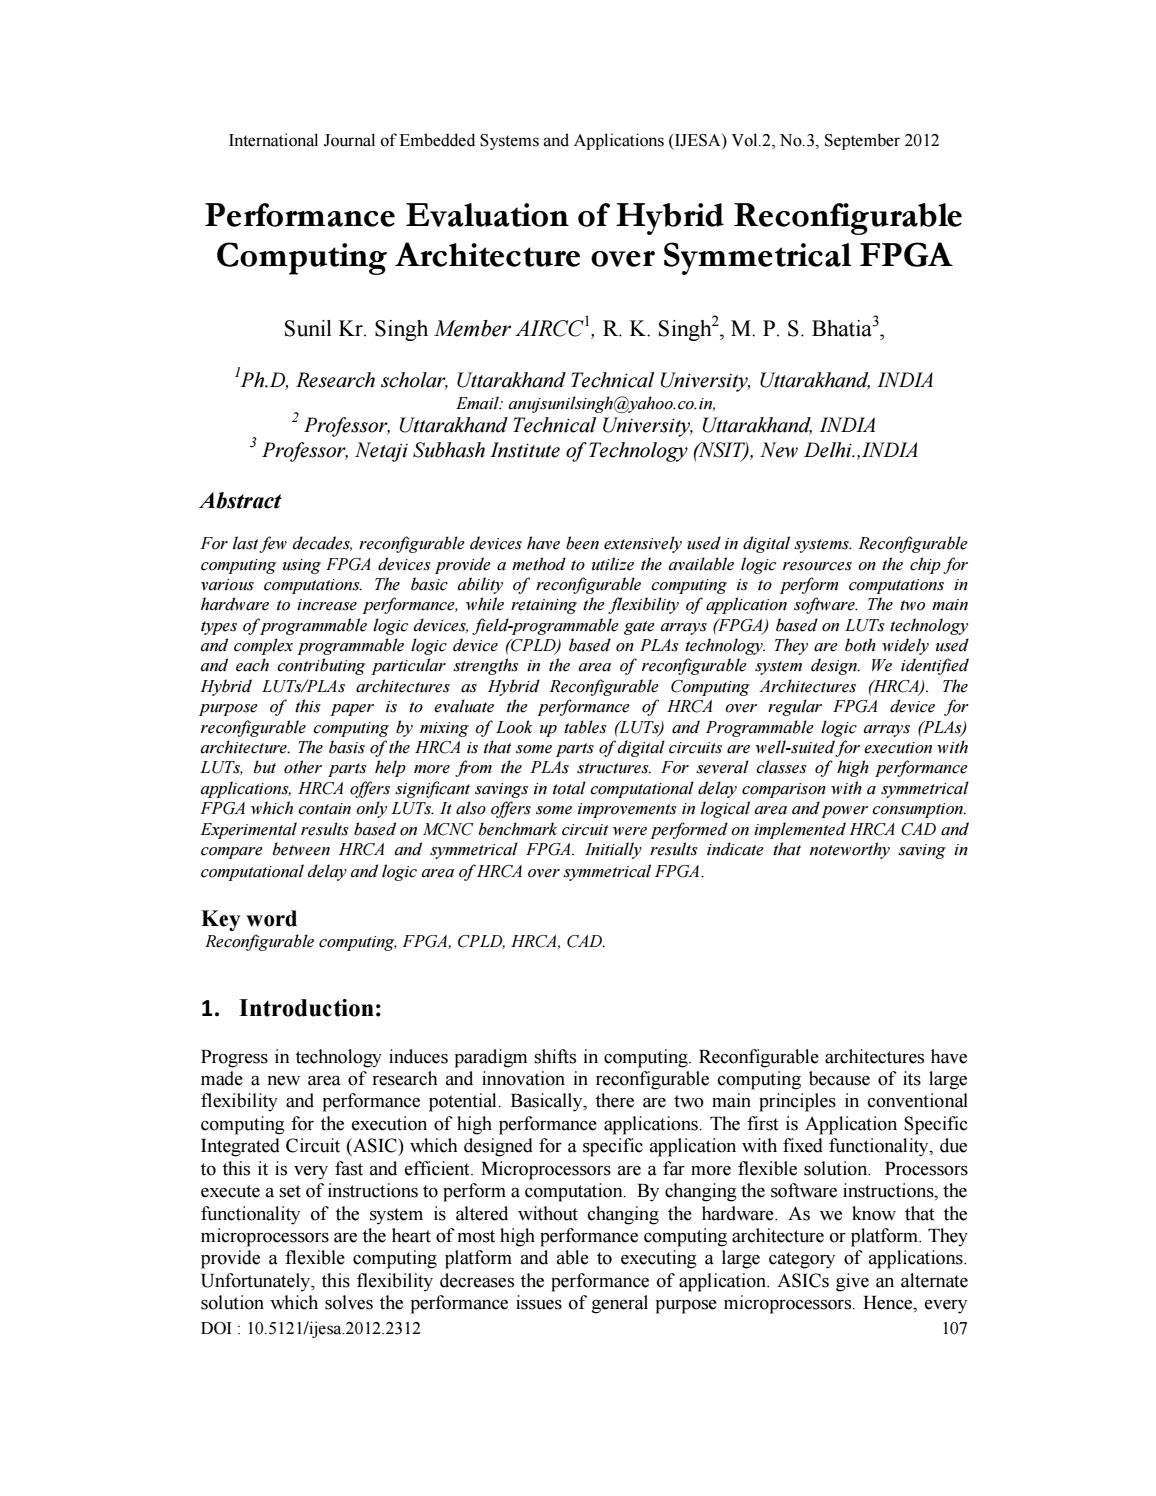 Performance Evaluation Of Hybrid Reconfigurable Computing Architecture Over Symmetrical Fpga By Ijesa Journal Issuu